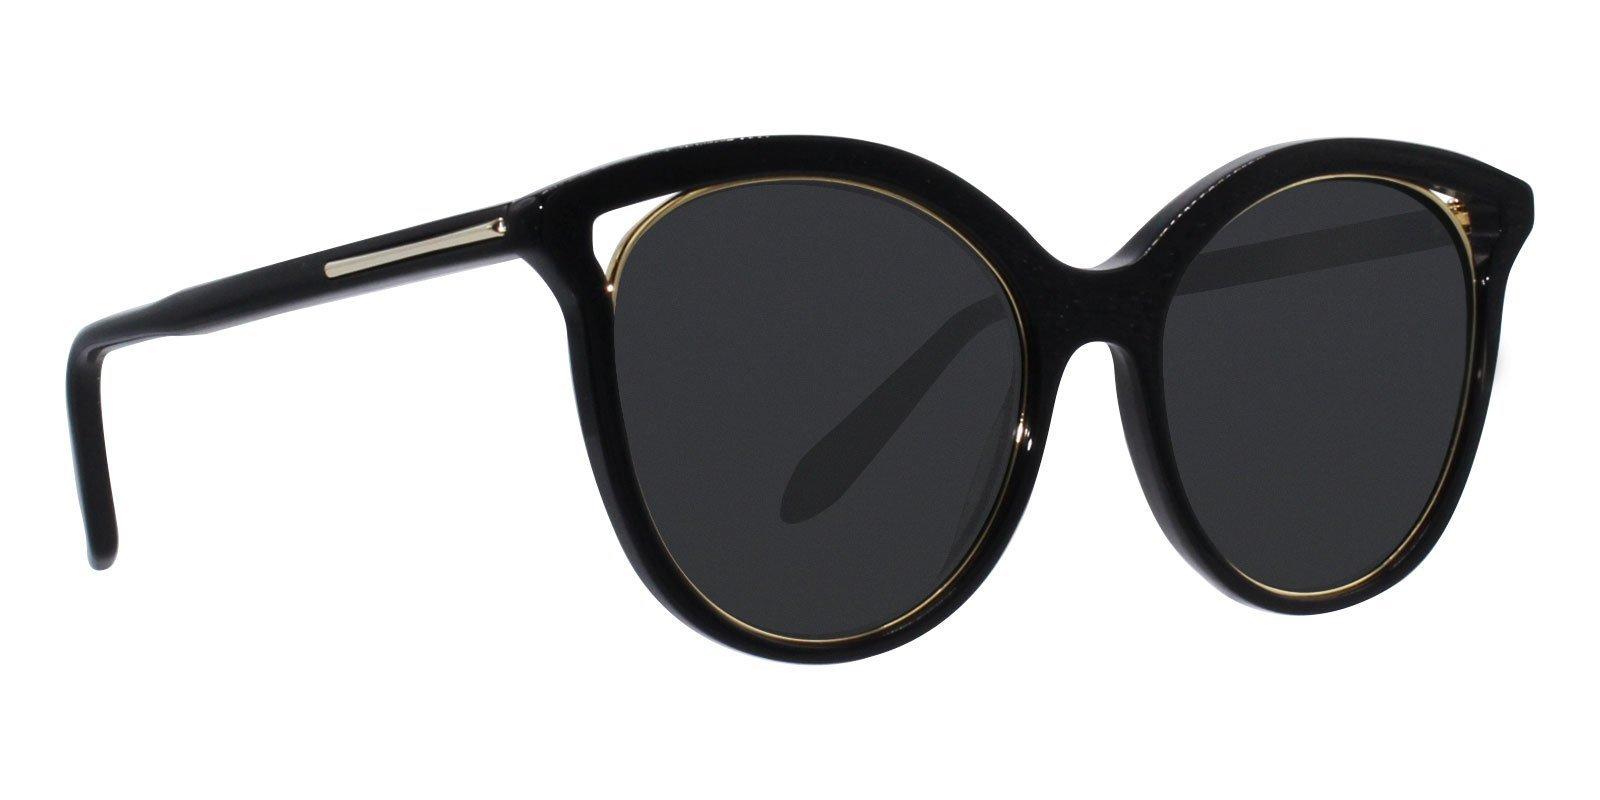 2d60be8874 Victoria Beckham - VBS123 Black - Black-sunglasses-Designer Eyes ...